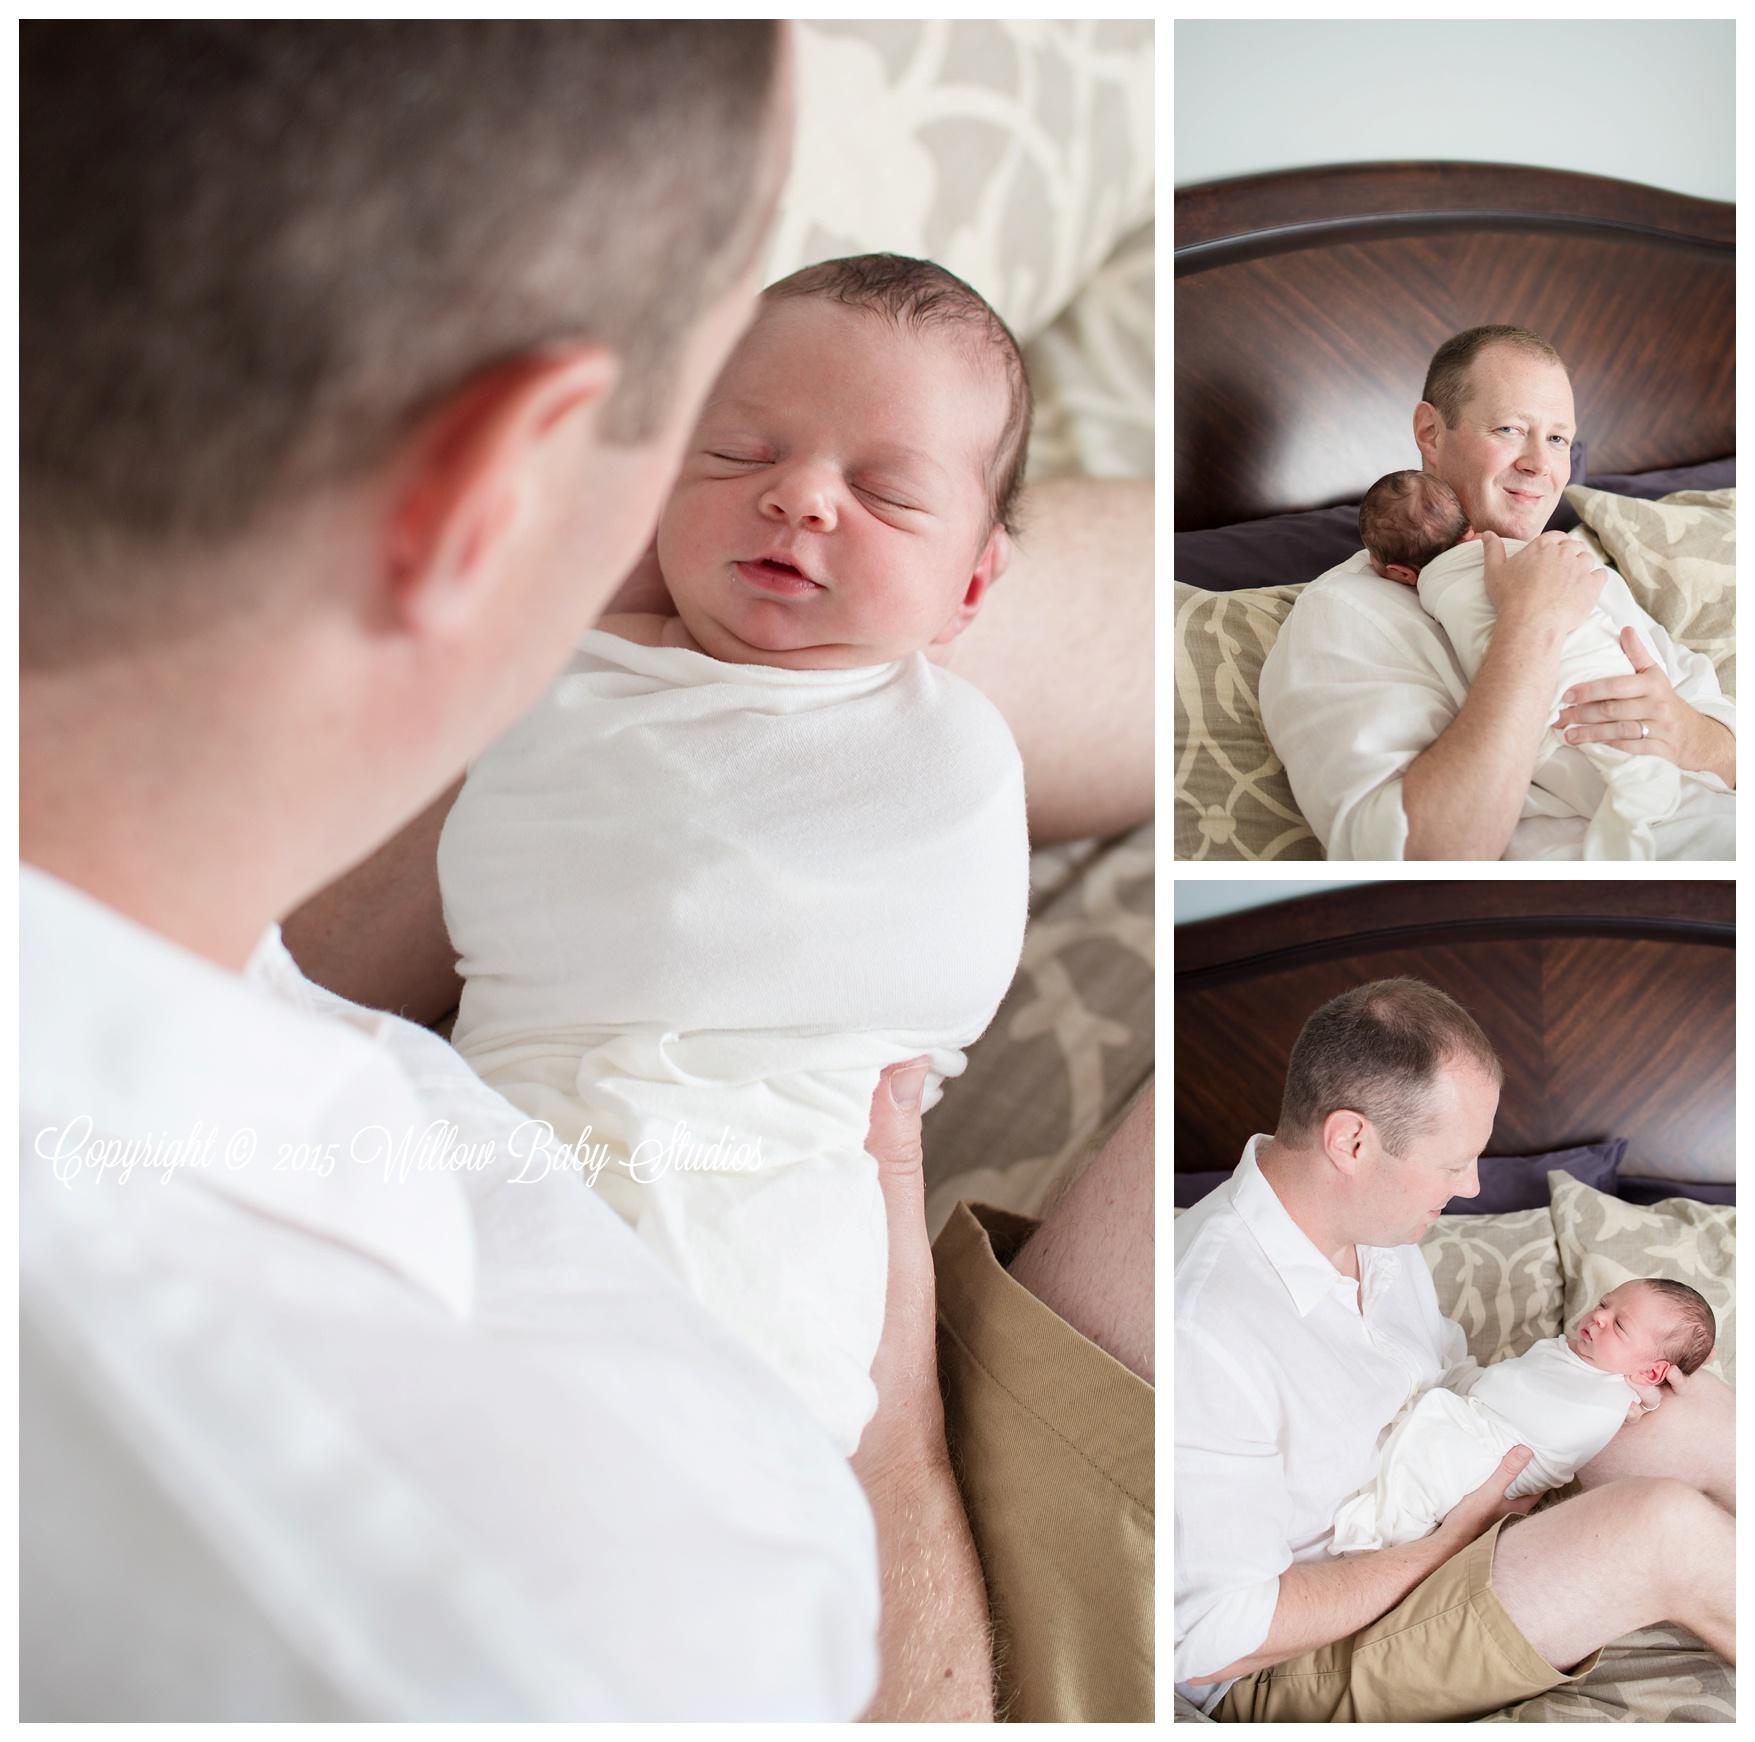 canton_newborn_photography_5